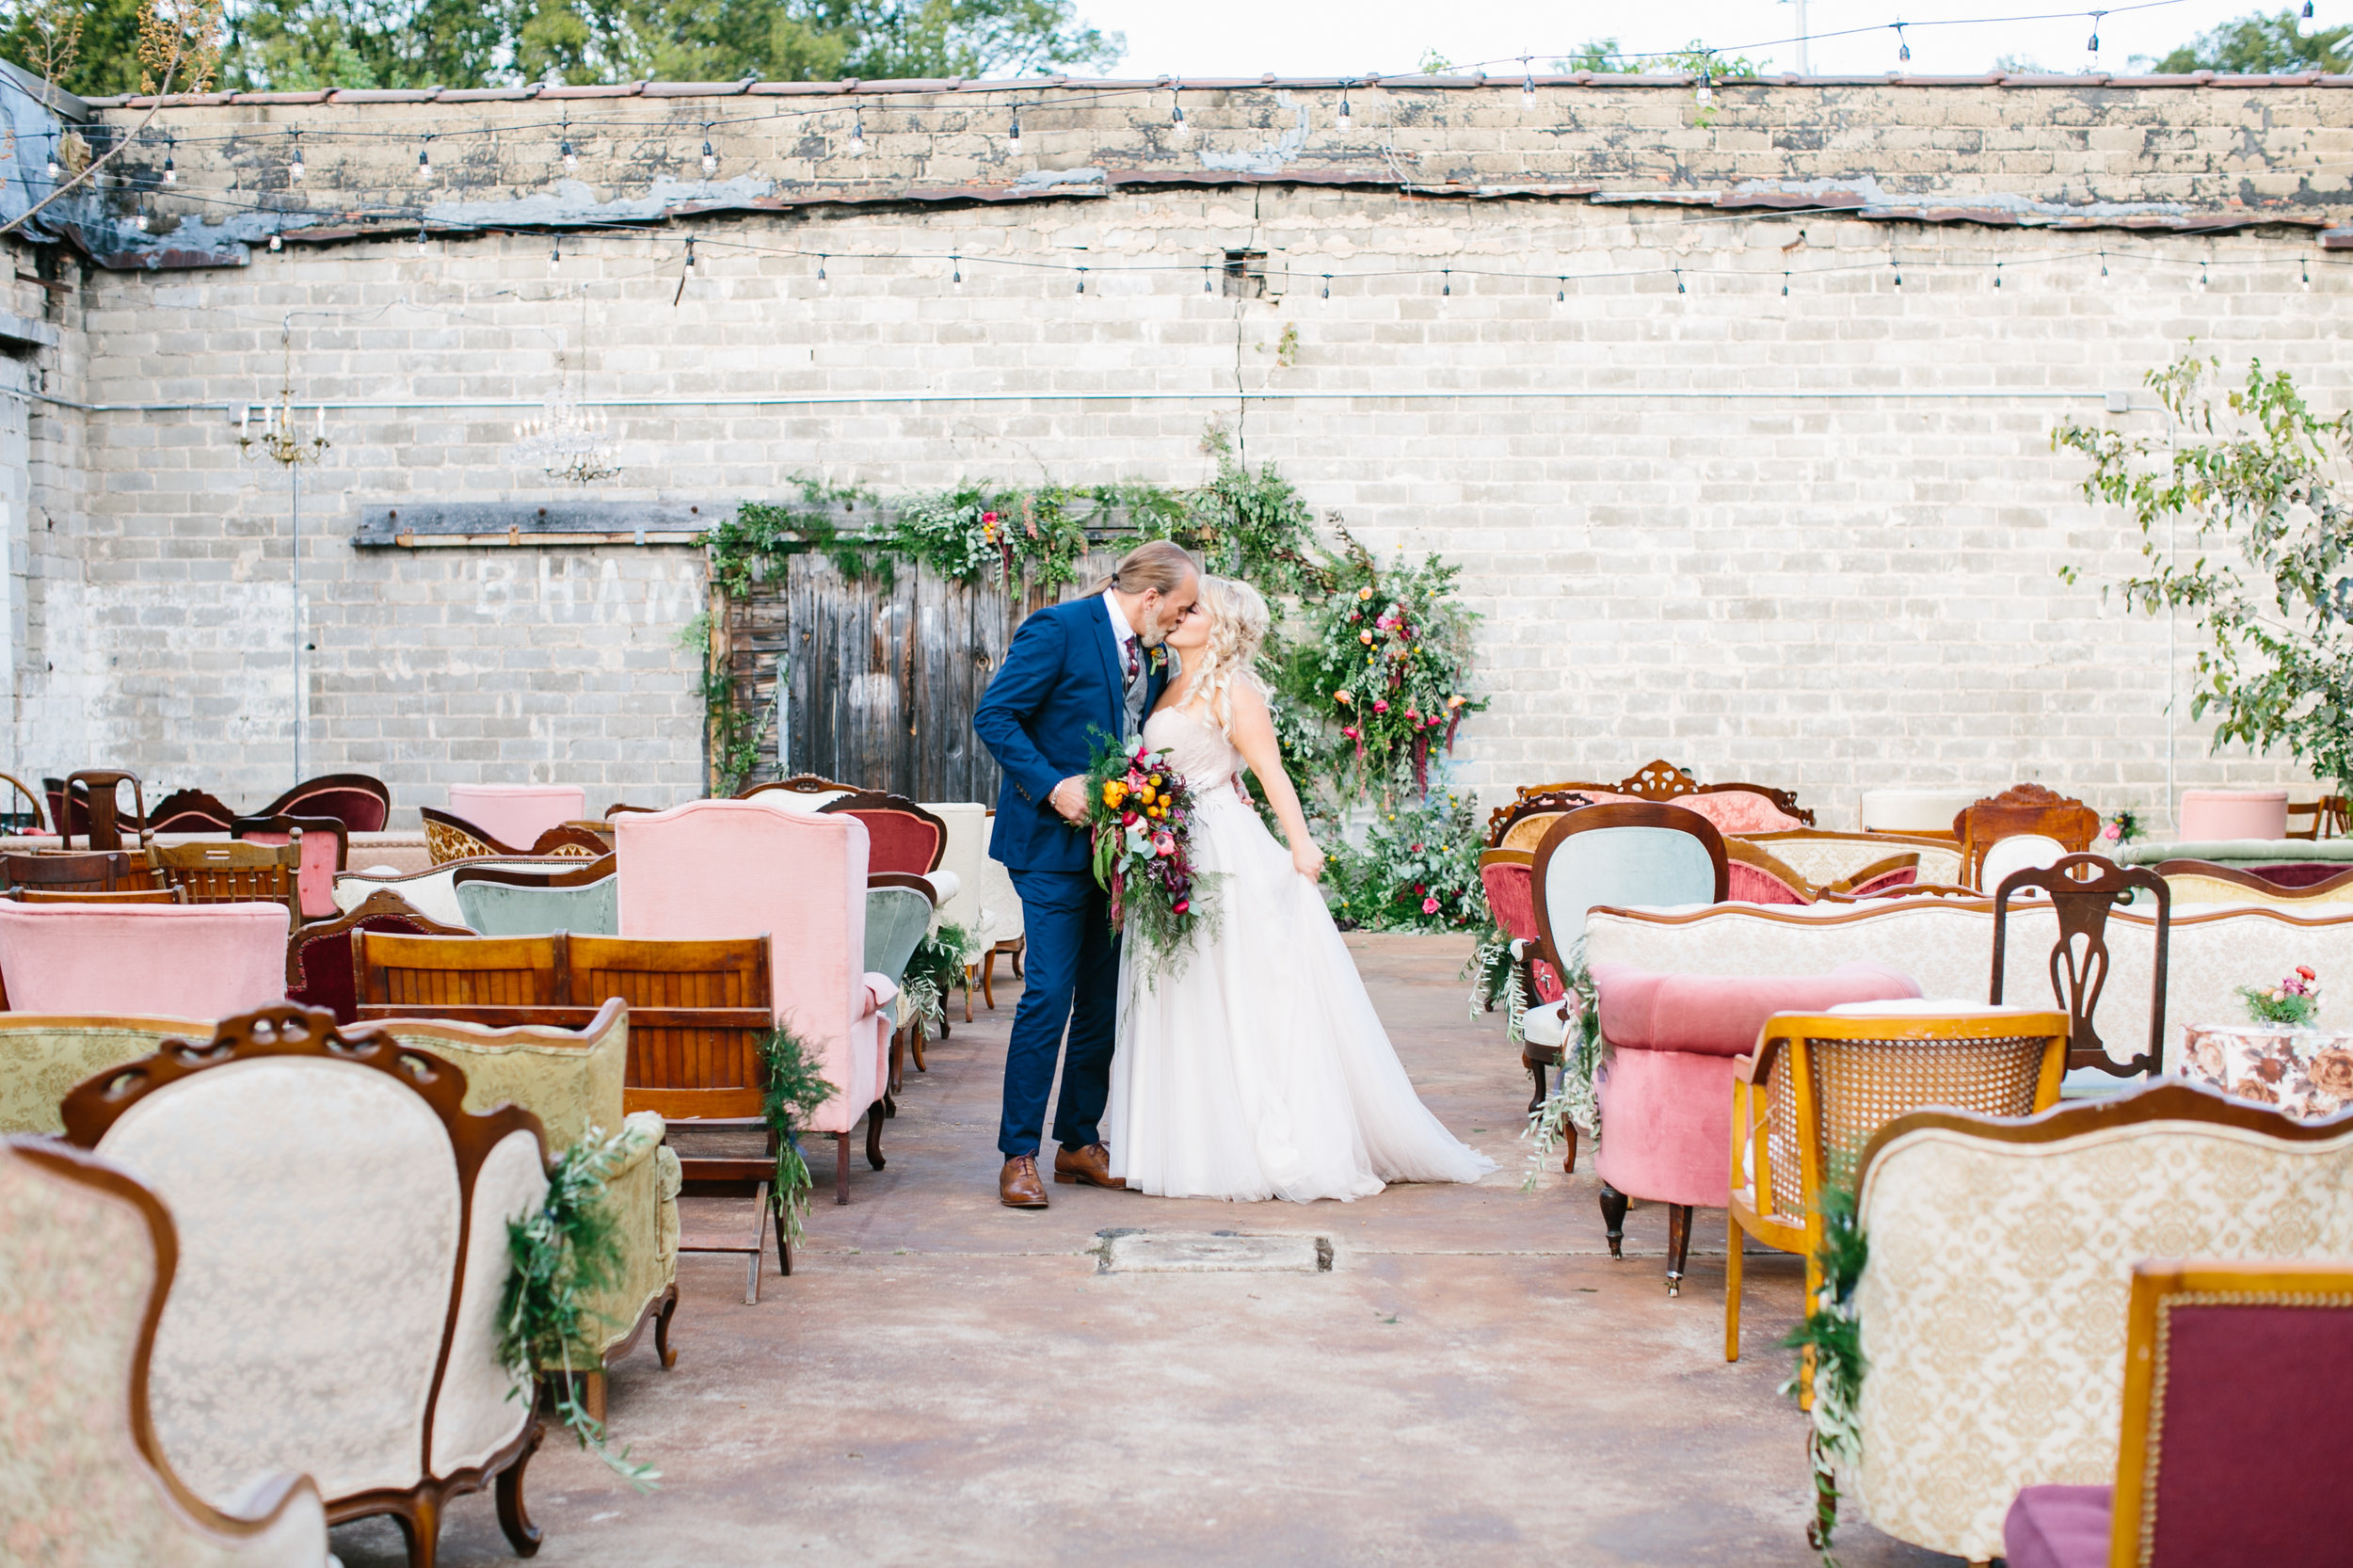 Mandi_Oliver_Chattanooga_Wedding_Abigail_Malone_Photography_Film-271.jpg